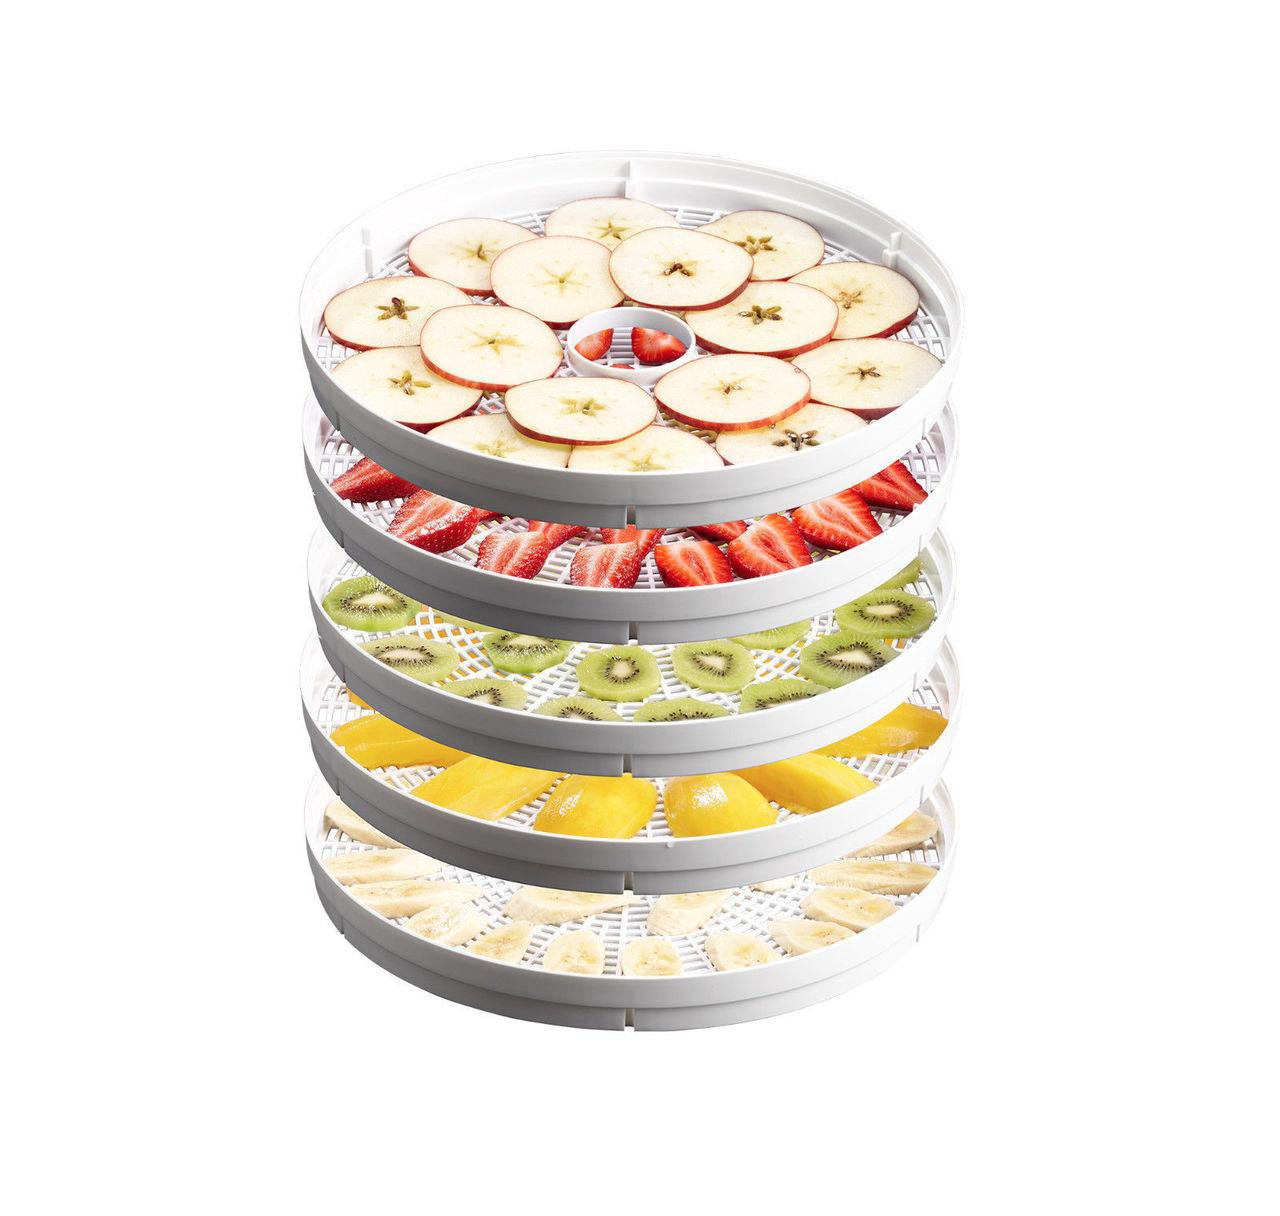 Sunbeam DT5600 Food Dehydrator